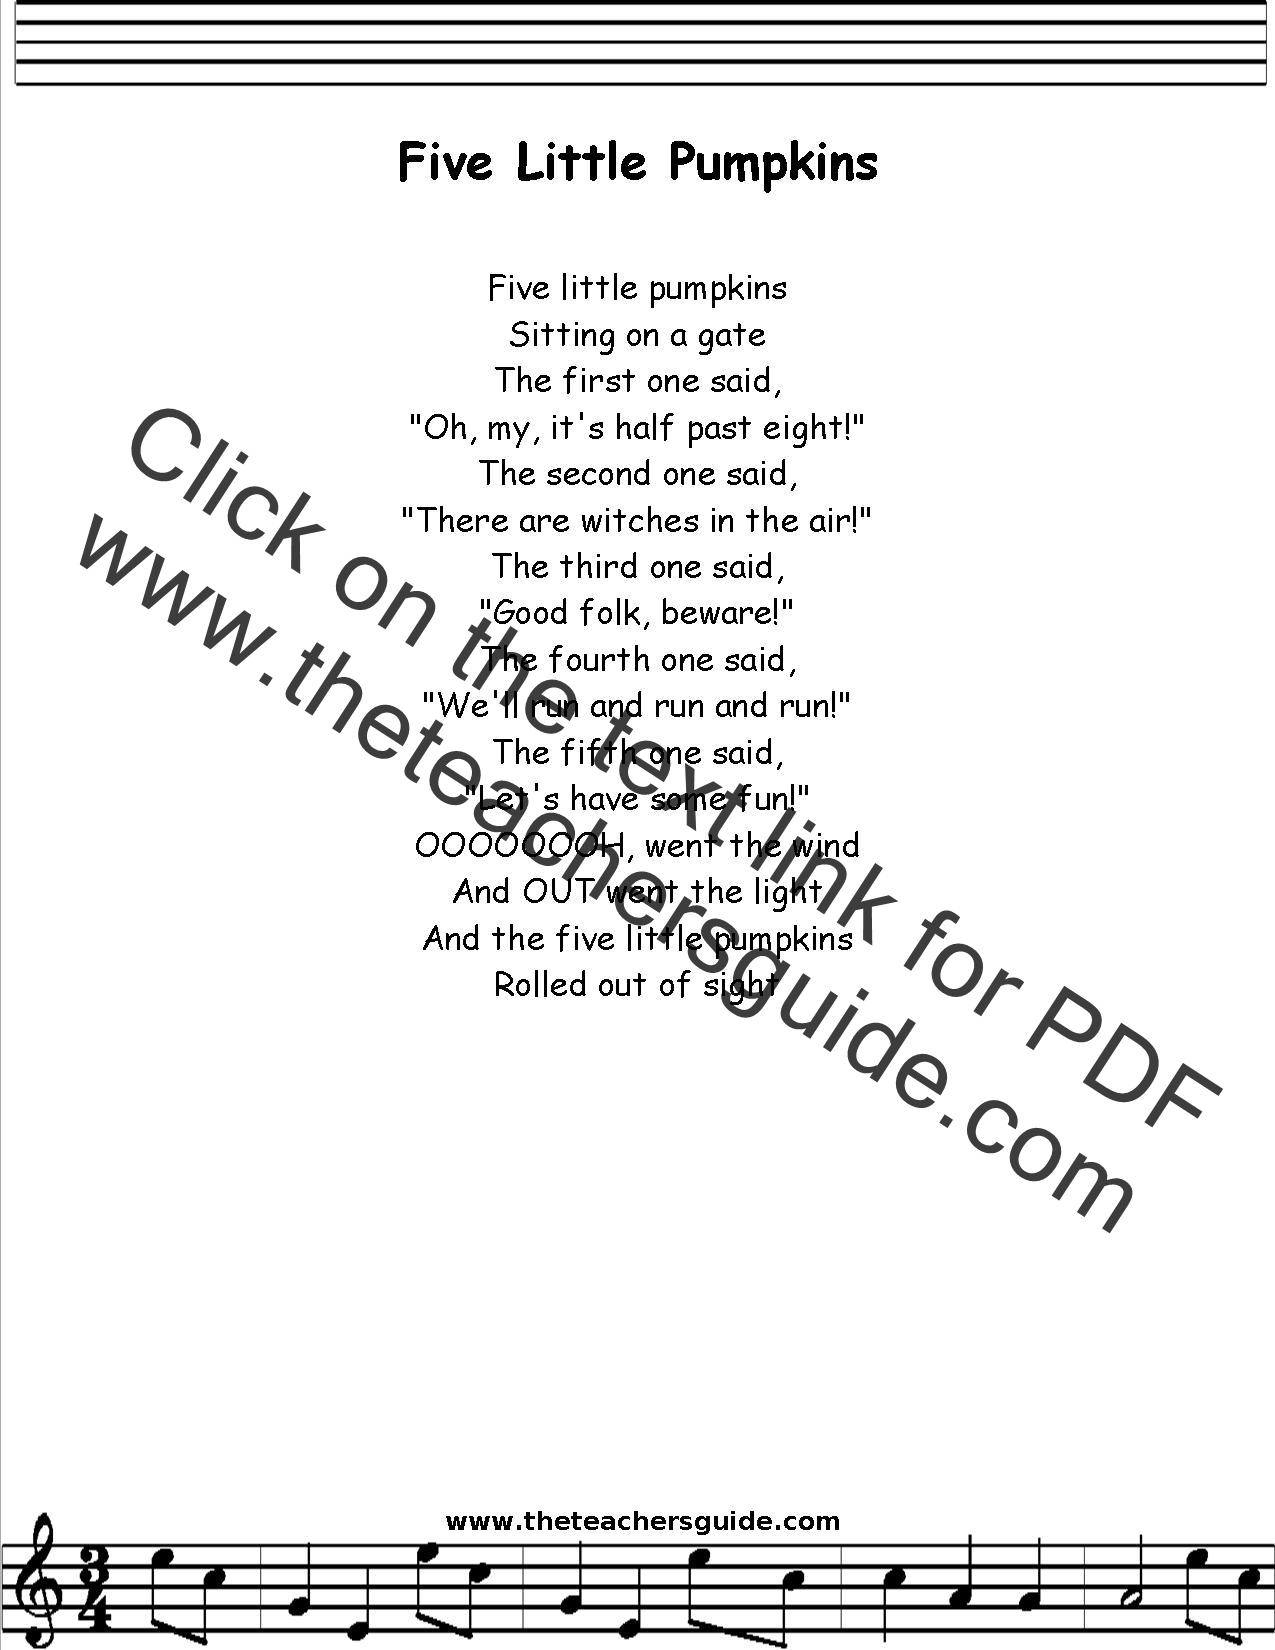 Five Little Pumpkins Lyrics Printout Midi And Video